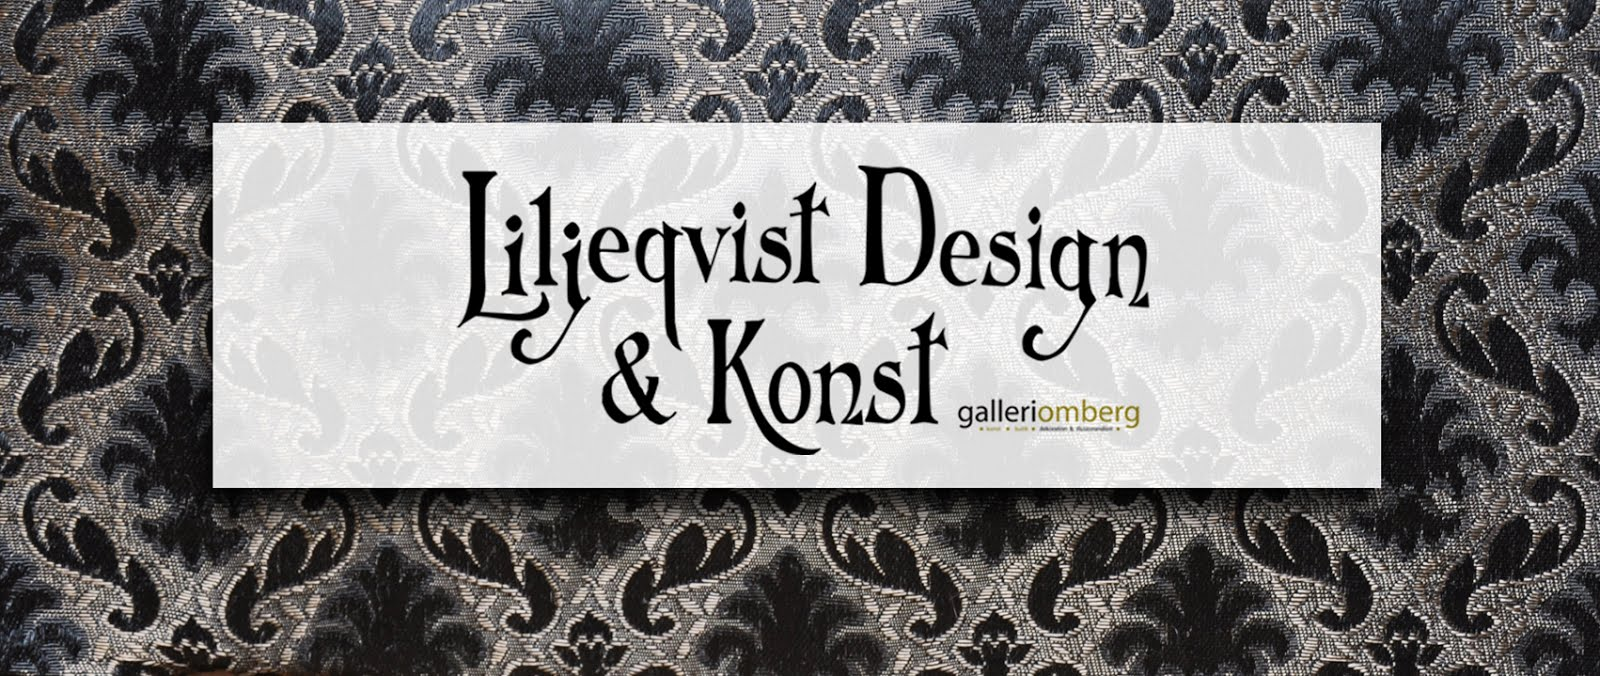 - Liljeqvist Design & Konst -